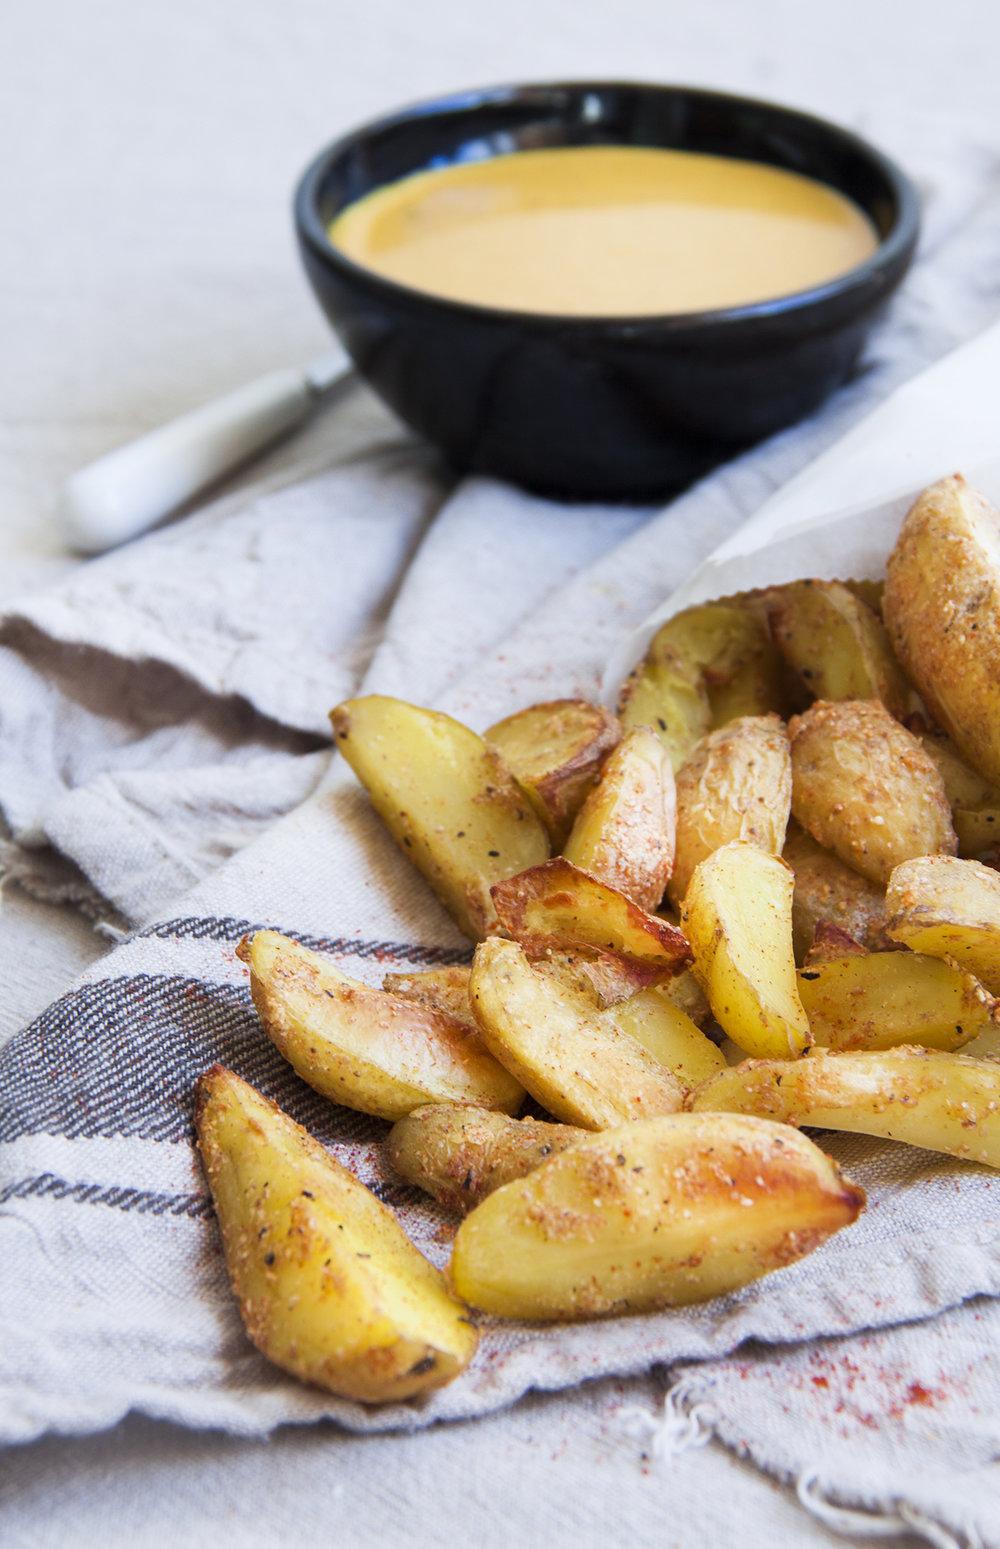 ovengebakken-aardappelpartjes-tahin-kurkumasaus-vegan-whole-foods-olievrij-02.jpg